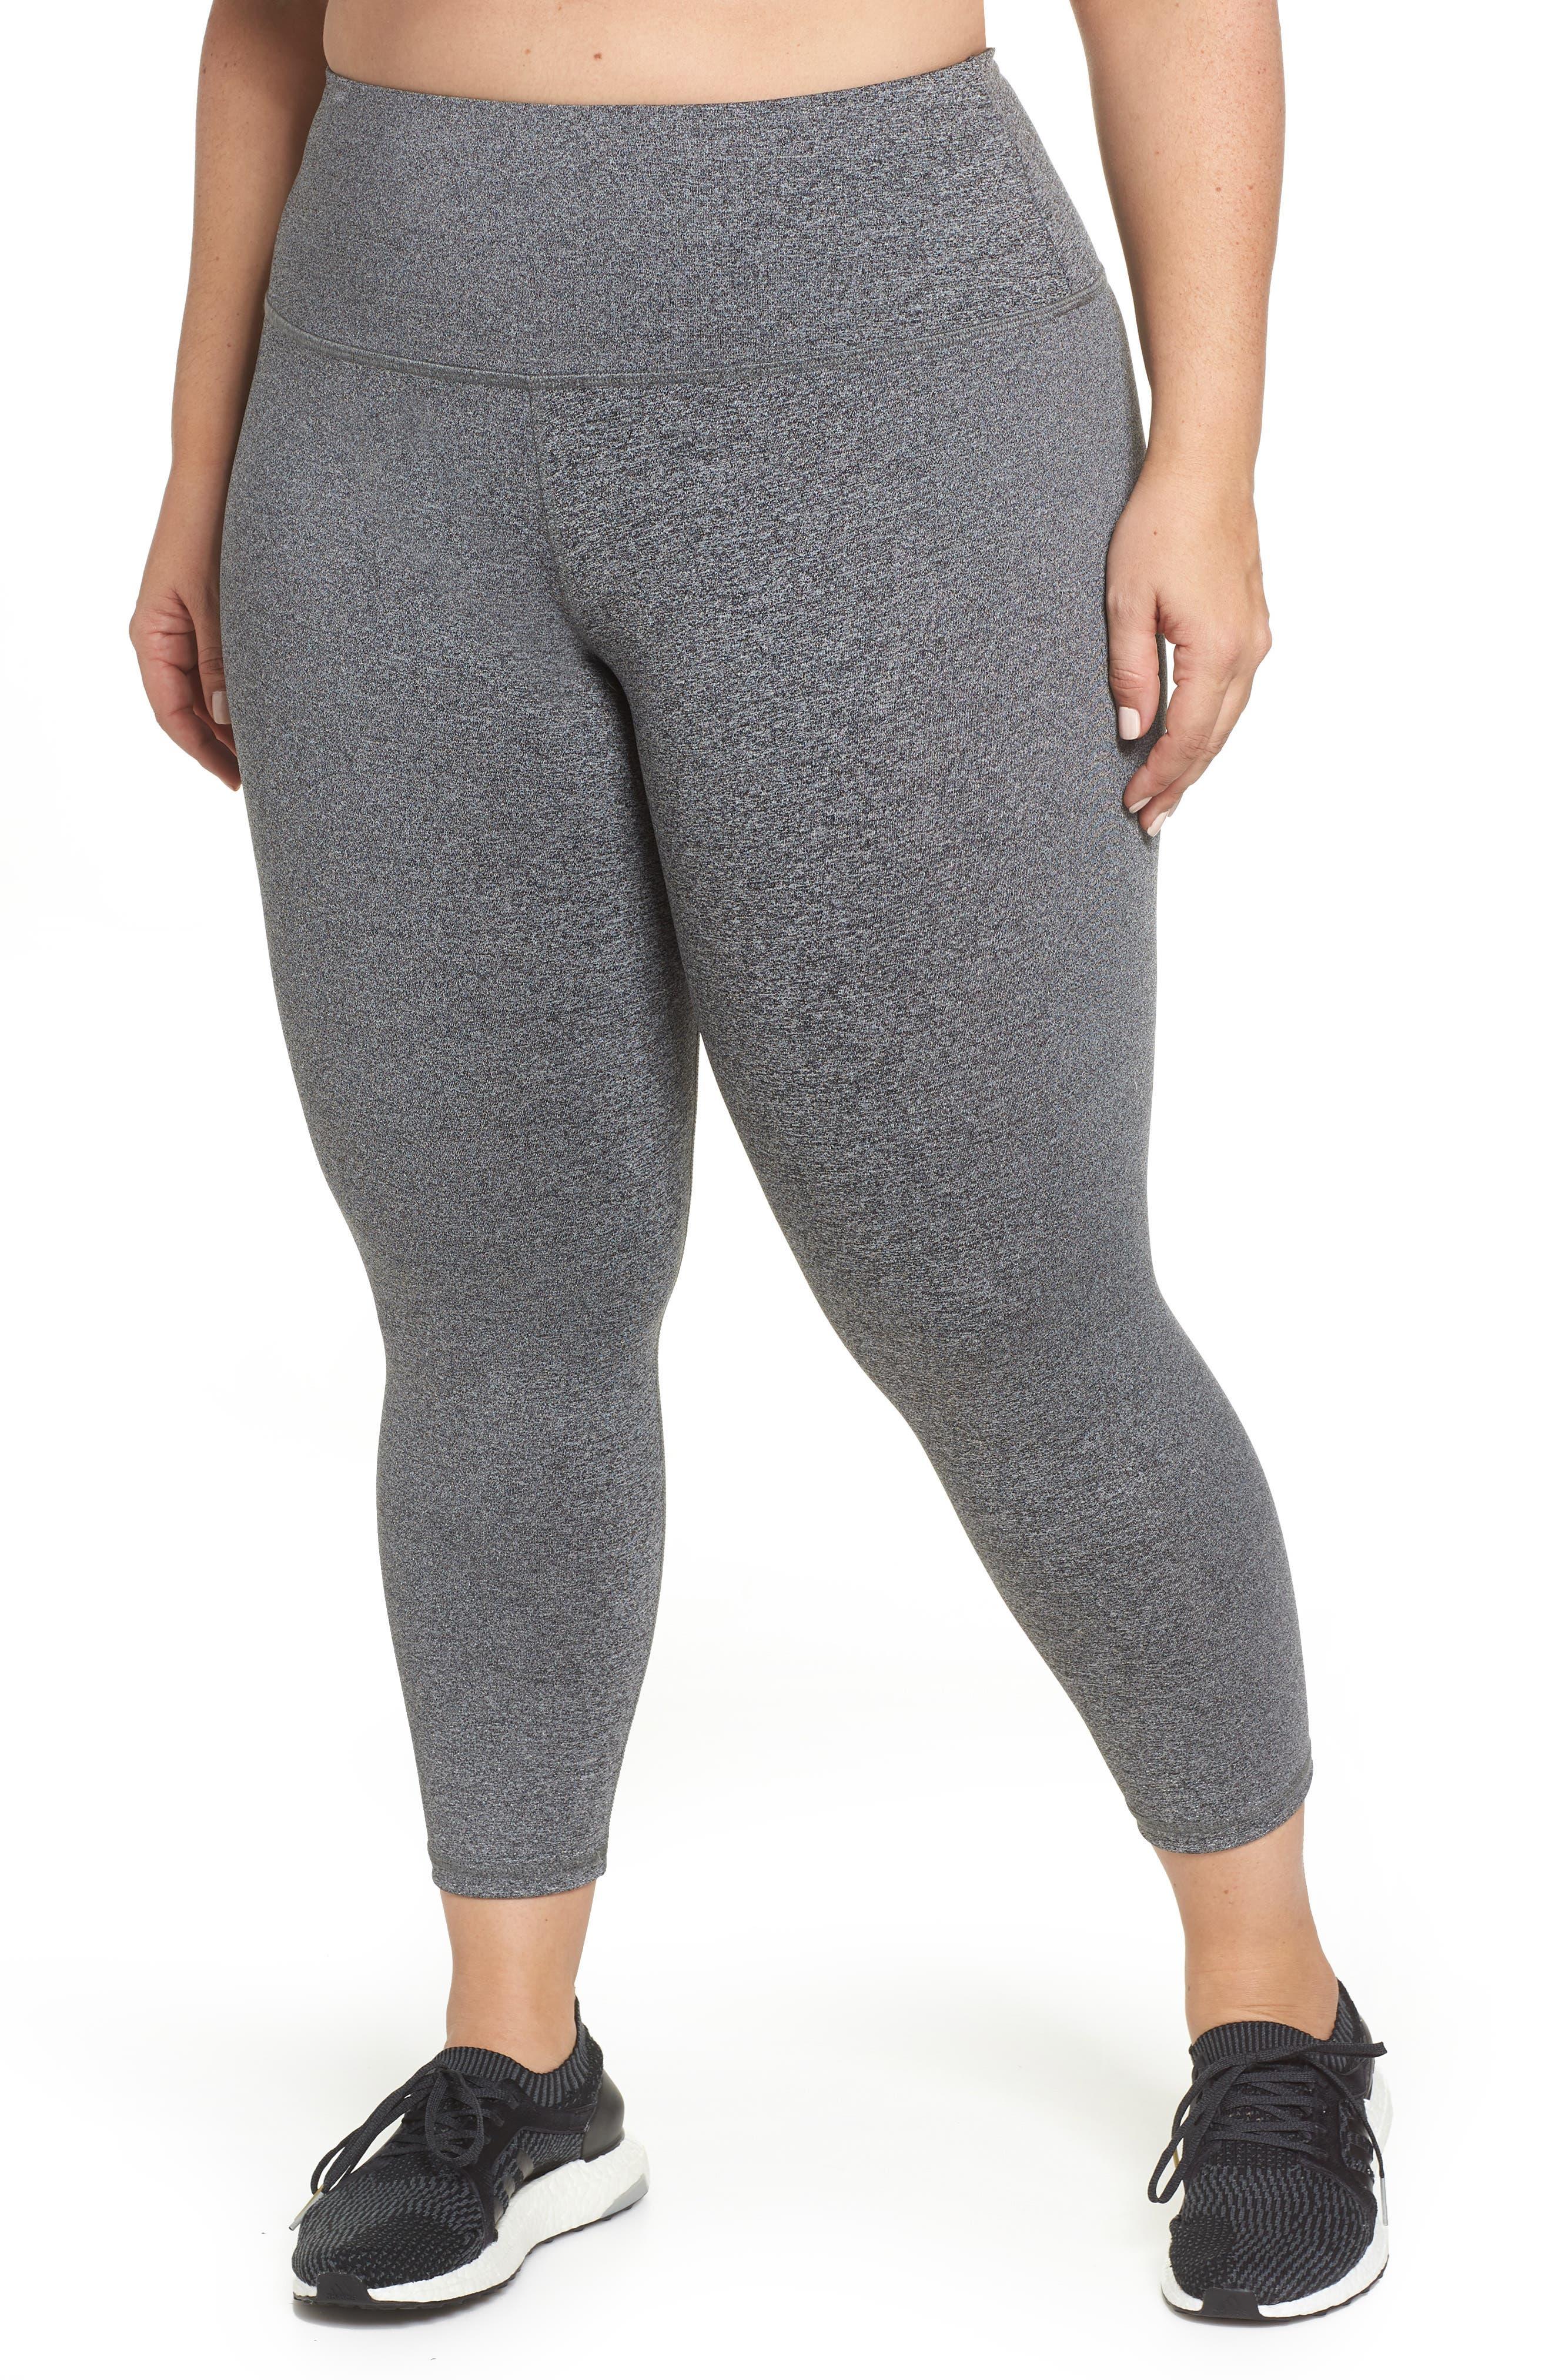 Plus Size Lola Getts Lola High Waist Skinny Capri Leggings, Grey